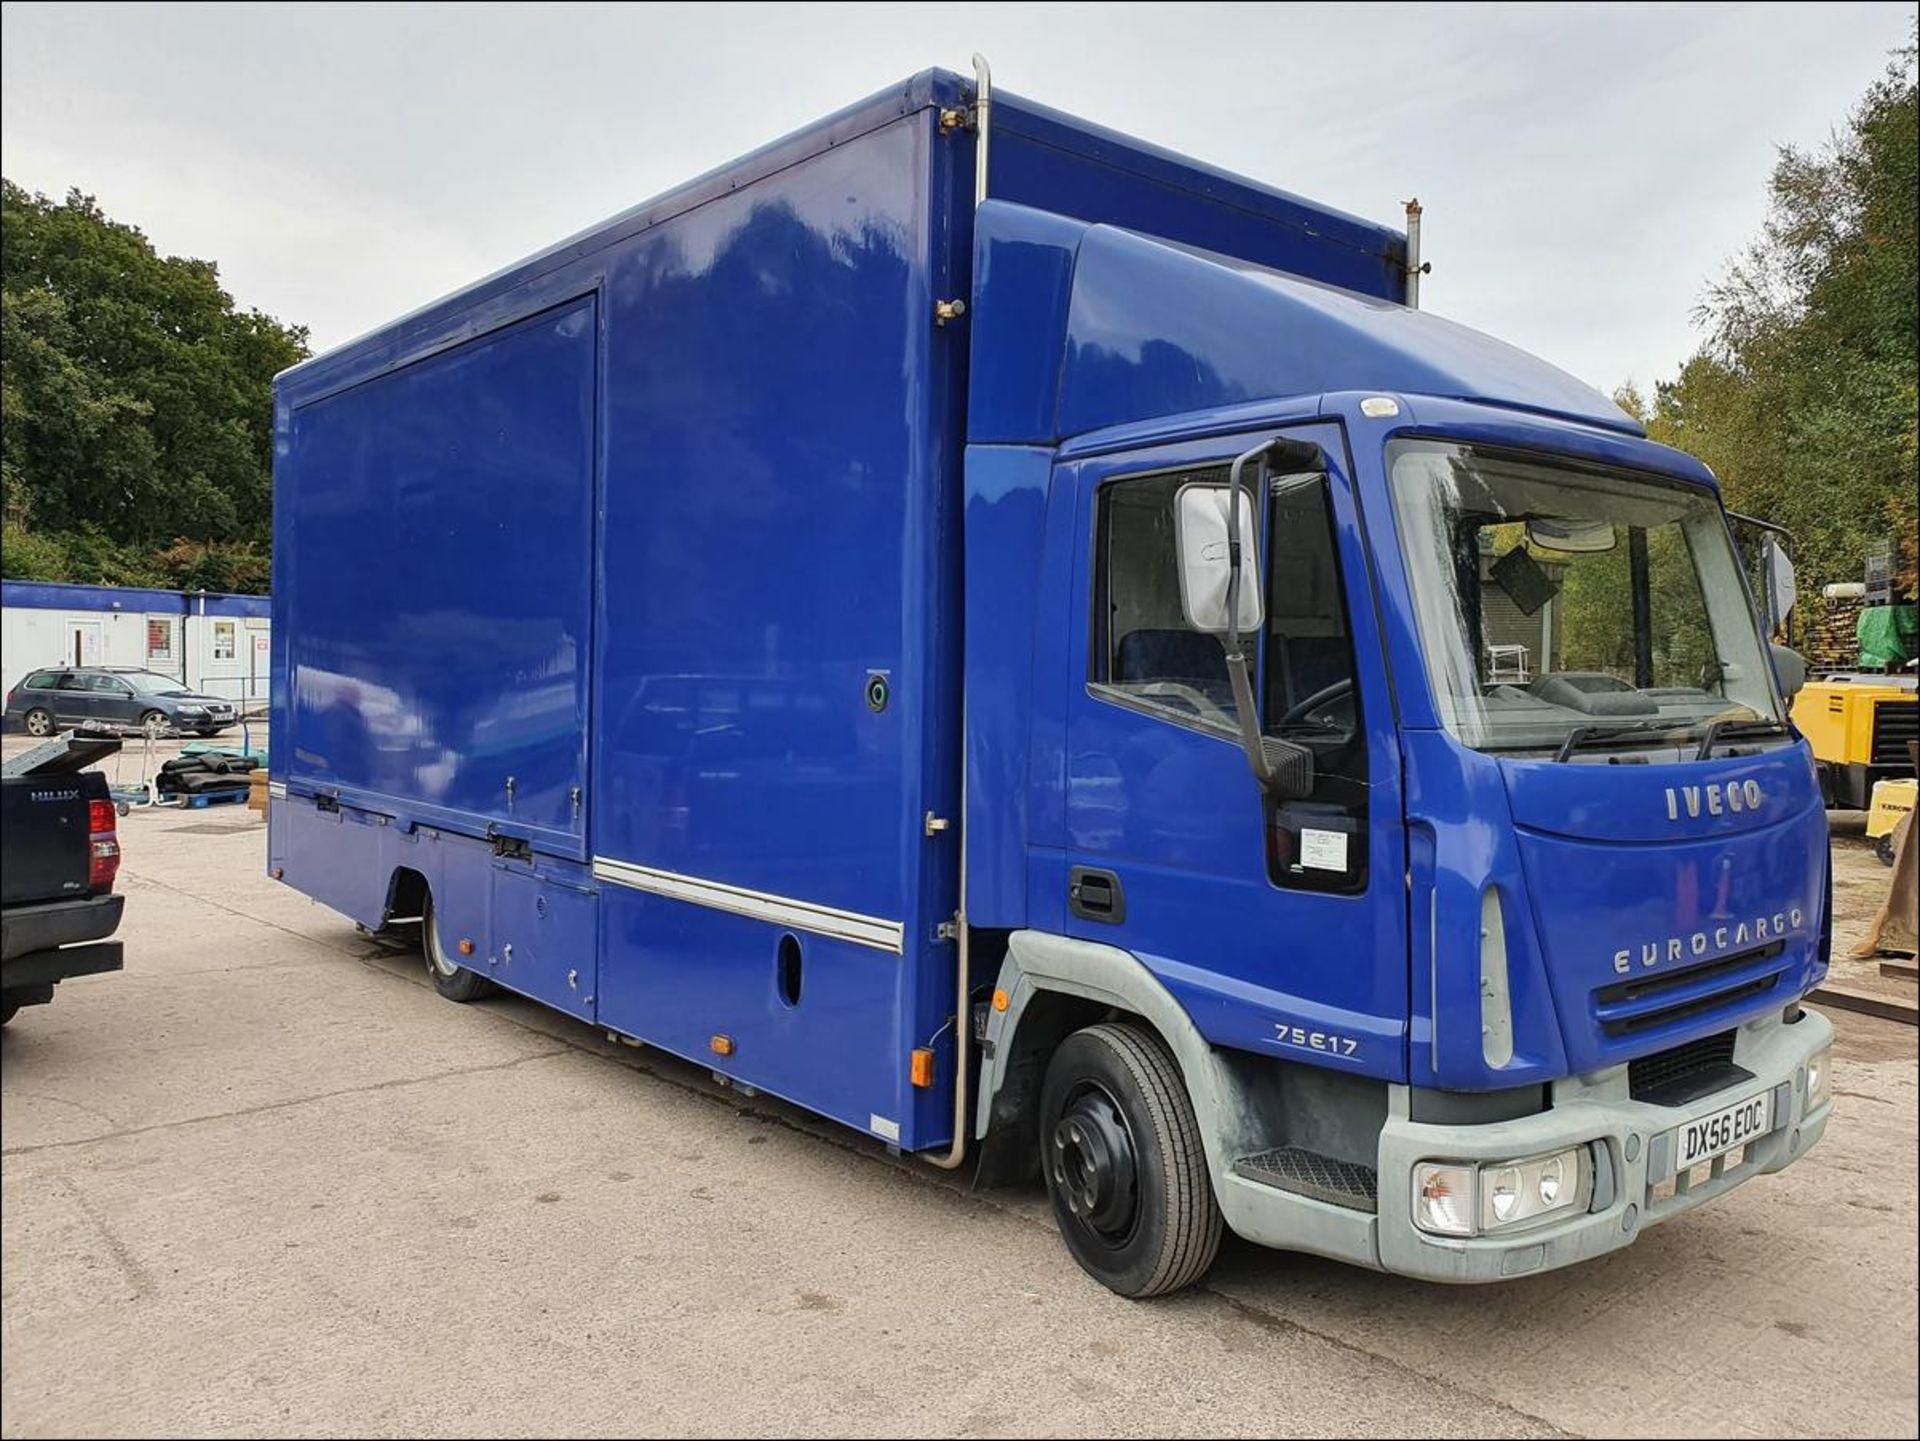 06/56 IVECO EUROCARGO EXHIBITION VEHICLE - 3920cc (Blue, 33k) - Image 6 of 13